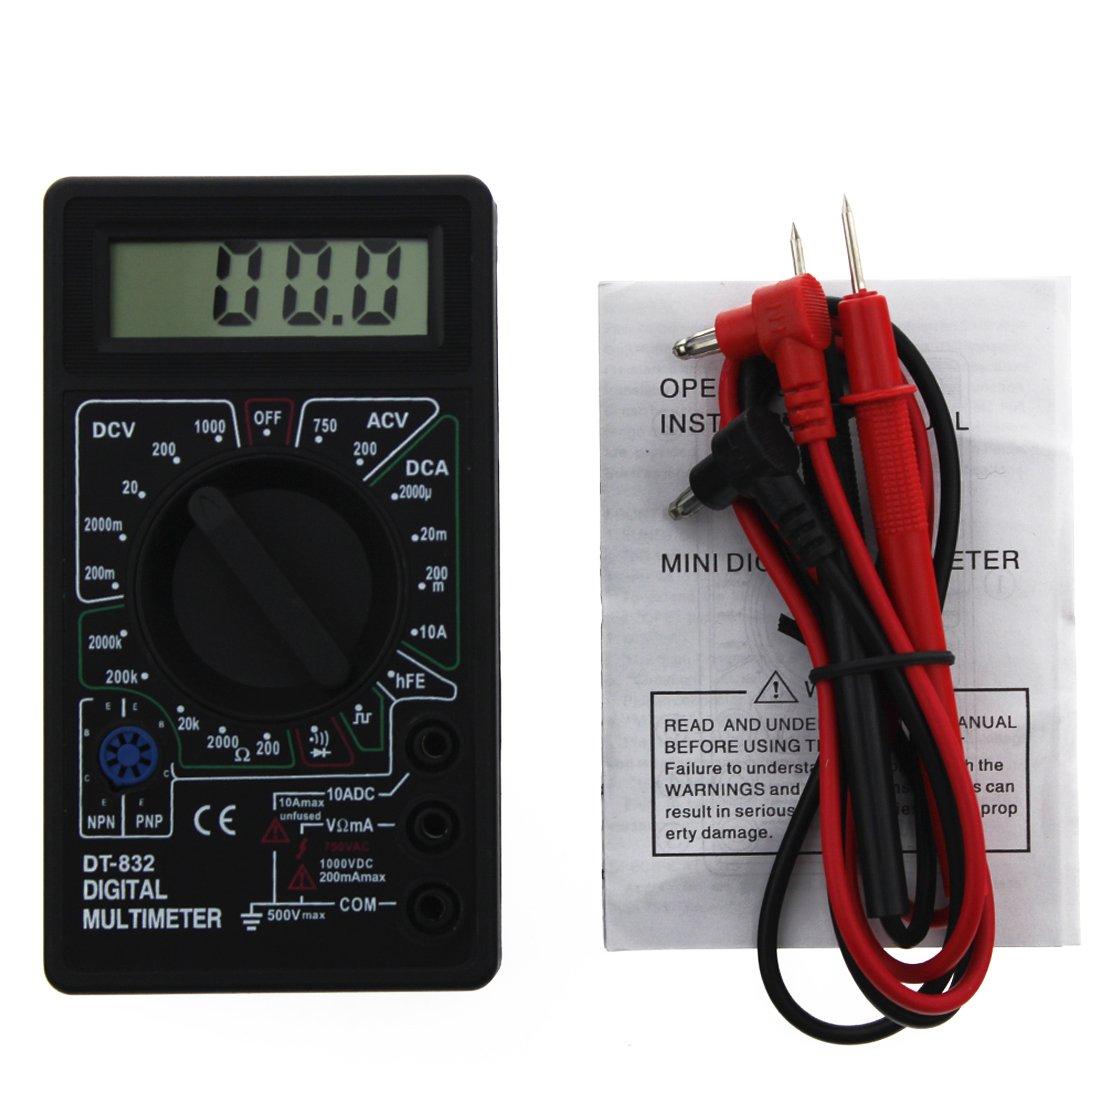 DT-832 Mini Type Multifunctional Handheld Digital Multimeter Black Rongwen TRTA11A